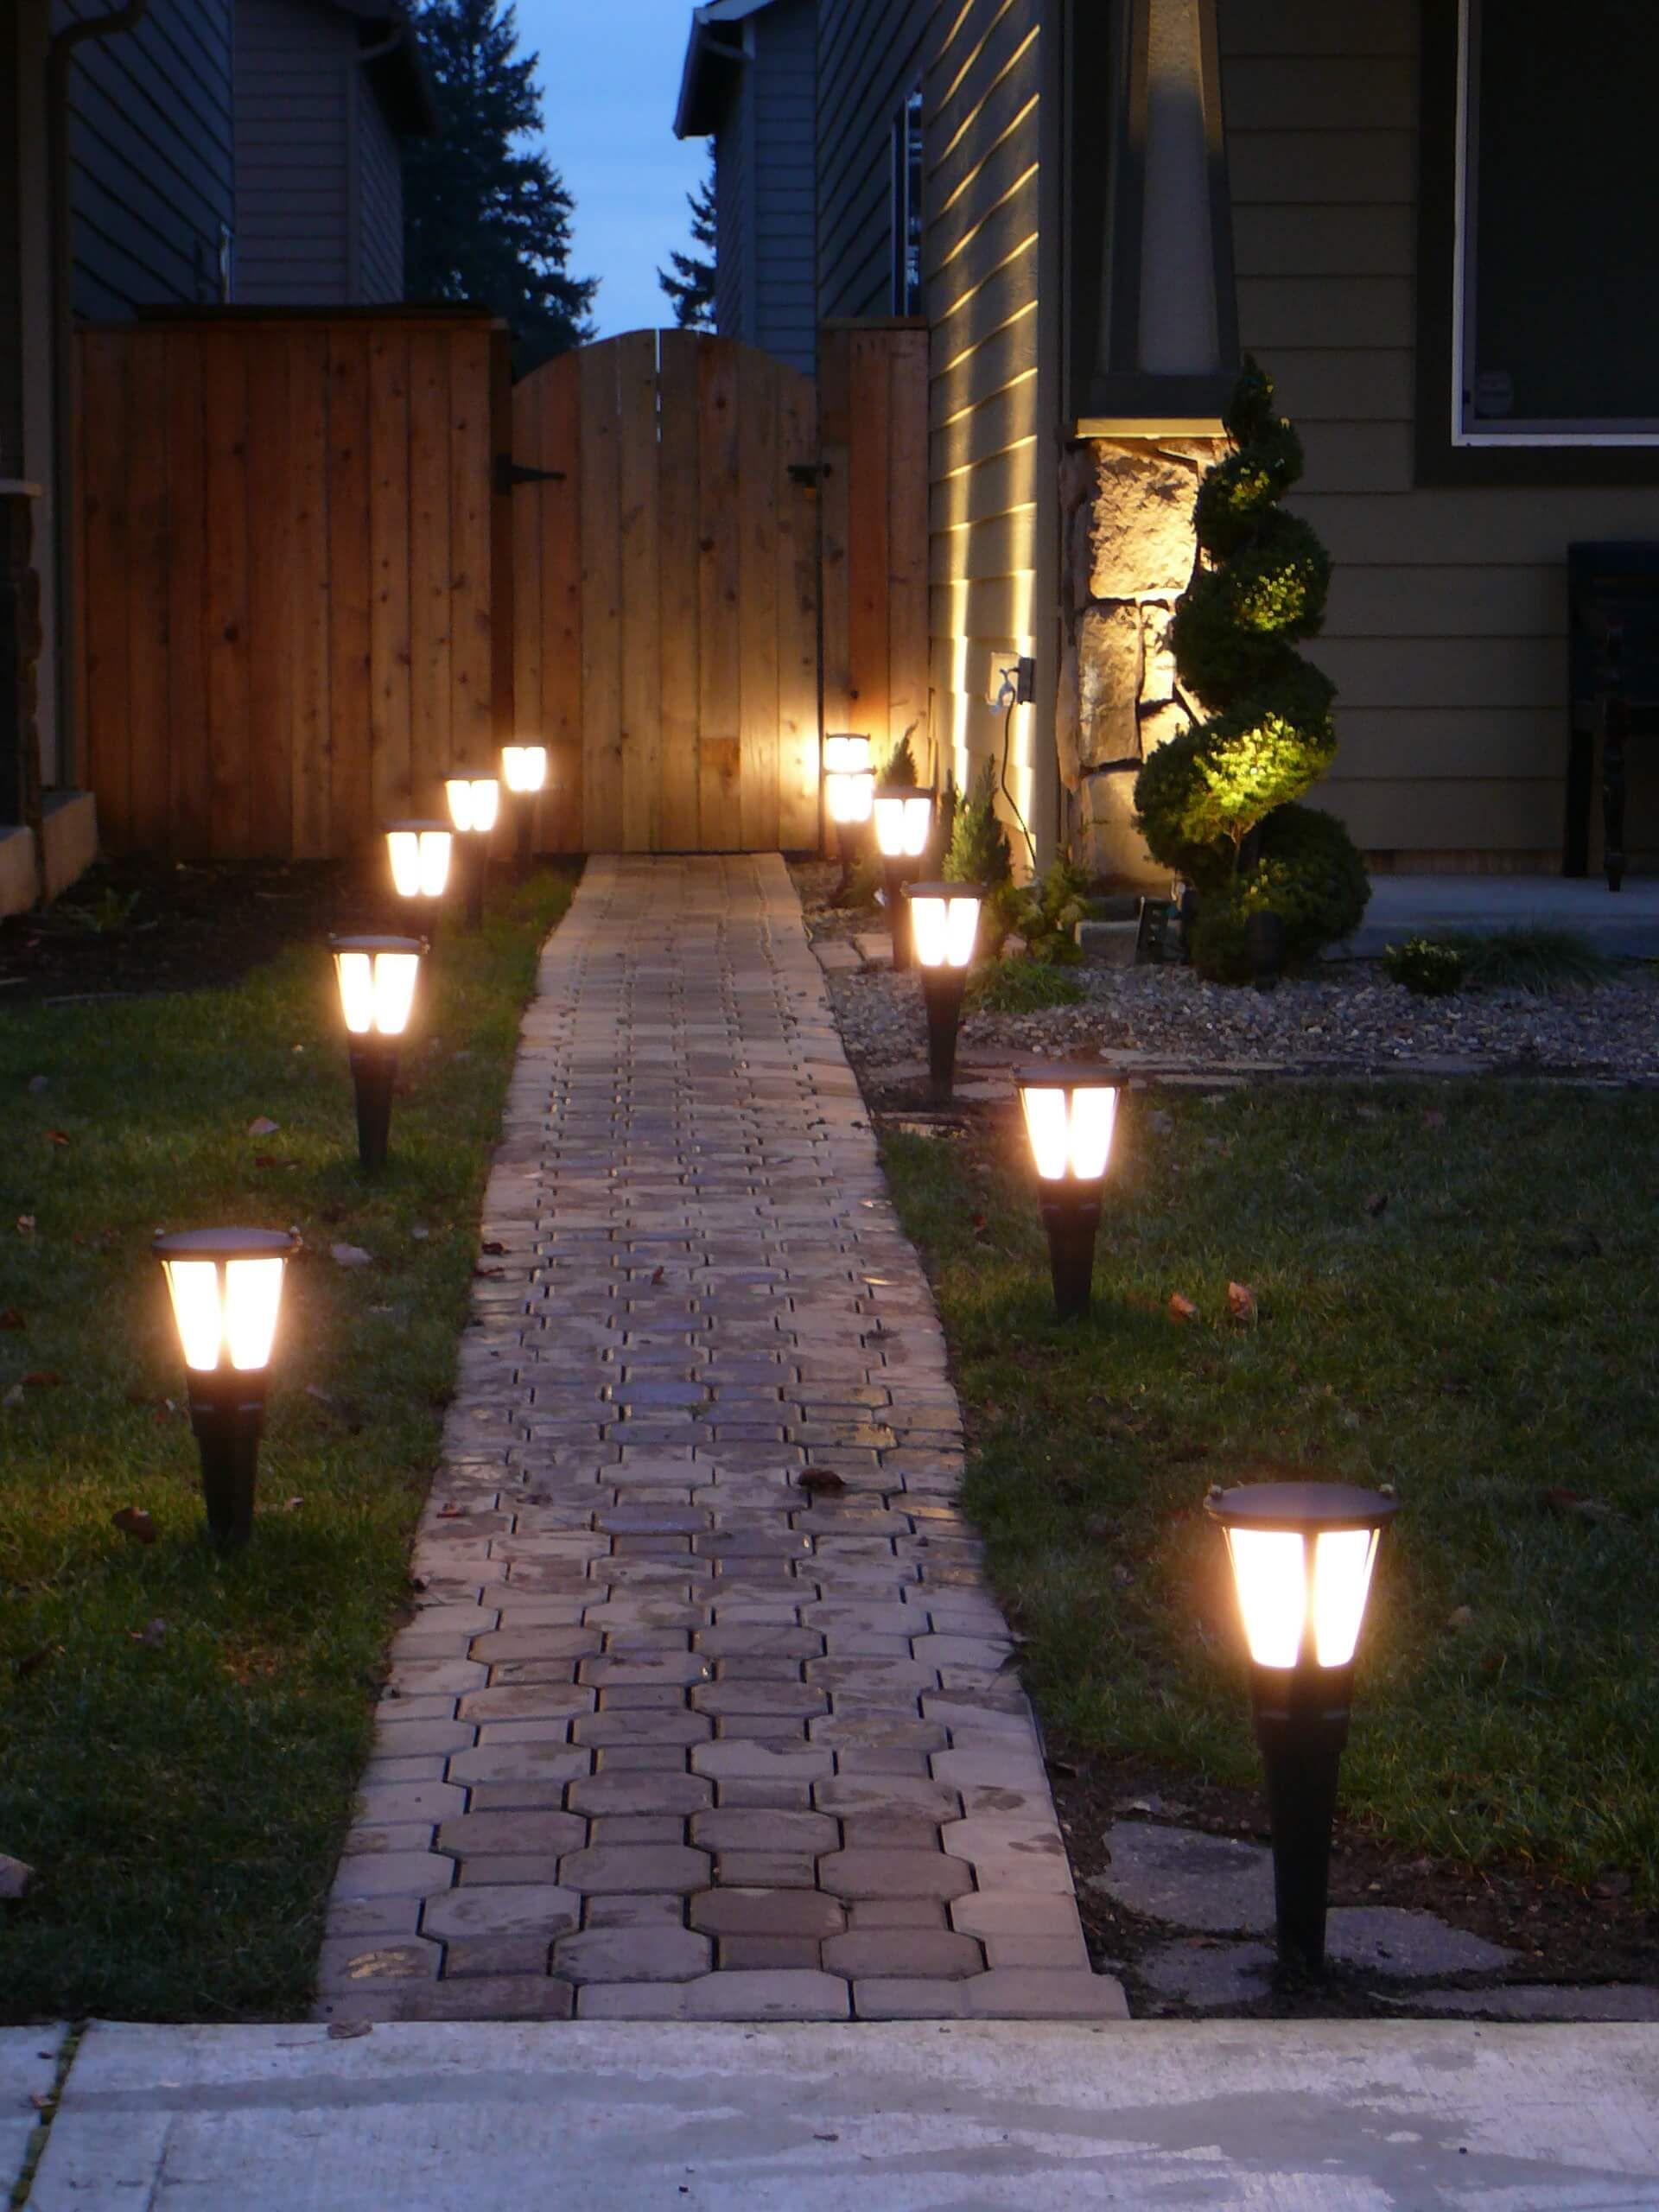 Simple Solar Brick Pathway Lights Backyard Lighting, Outdoor Wall Lighting,  Lights For Patio,